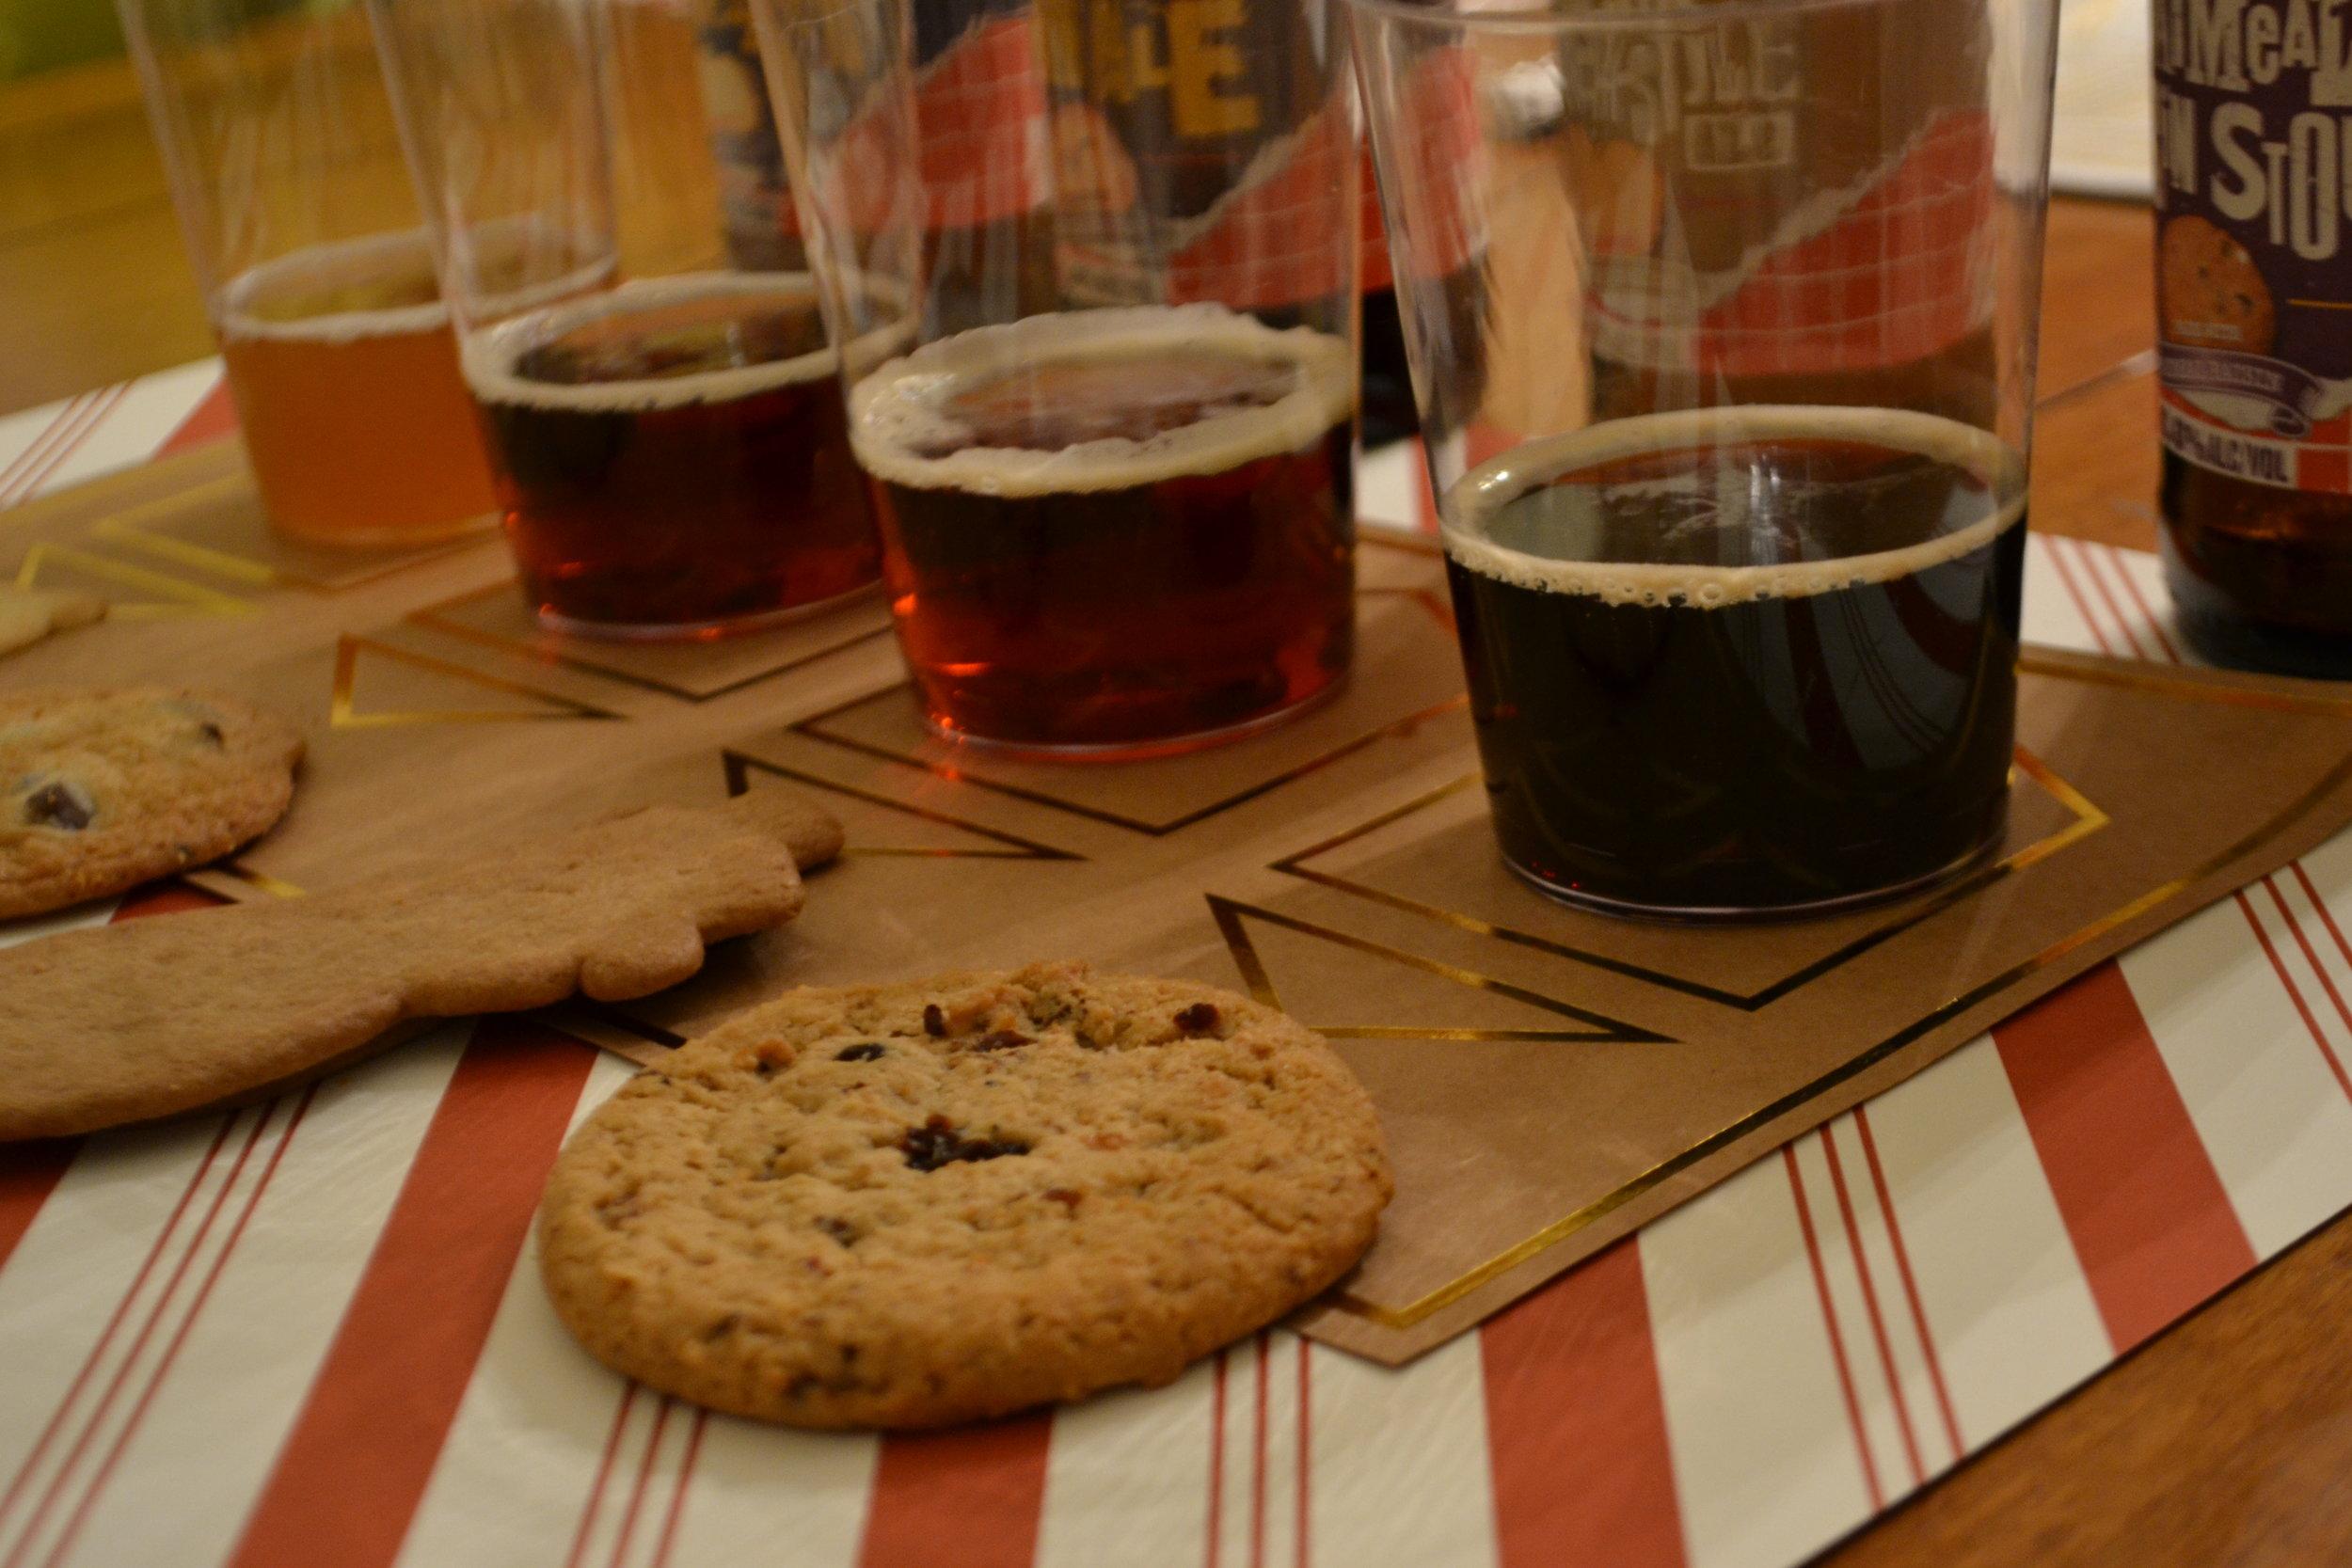 Cookies-Beer-at-an-angle.jpg